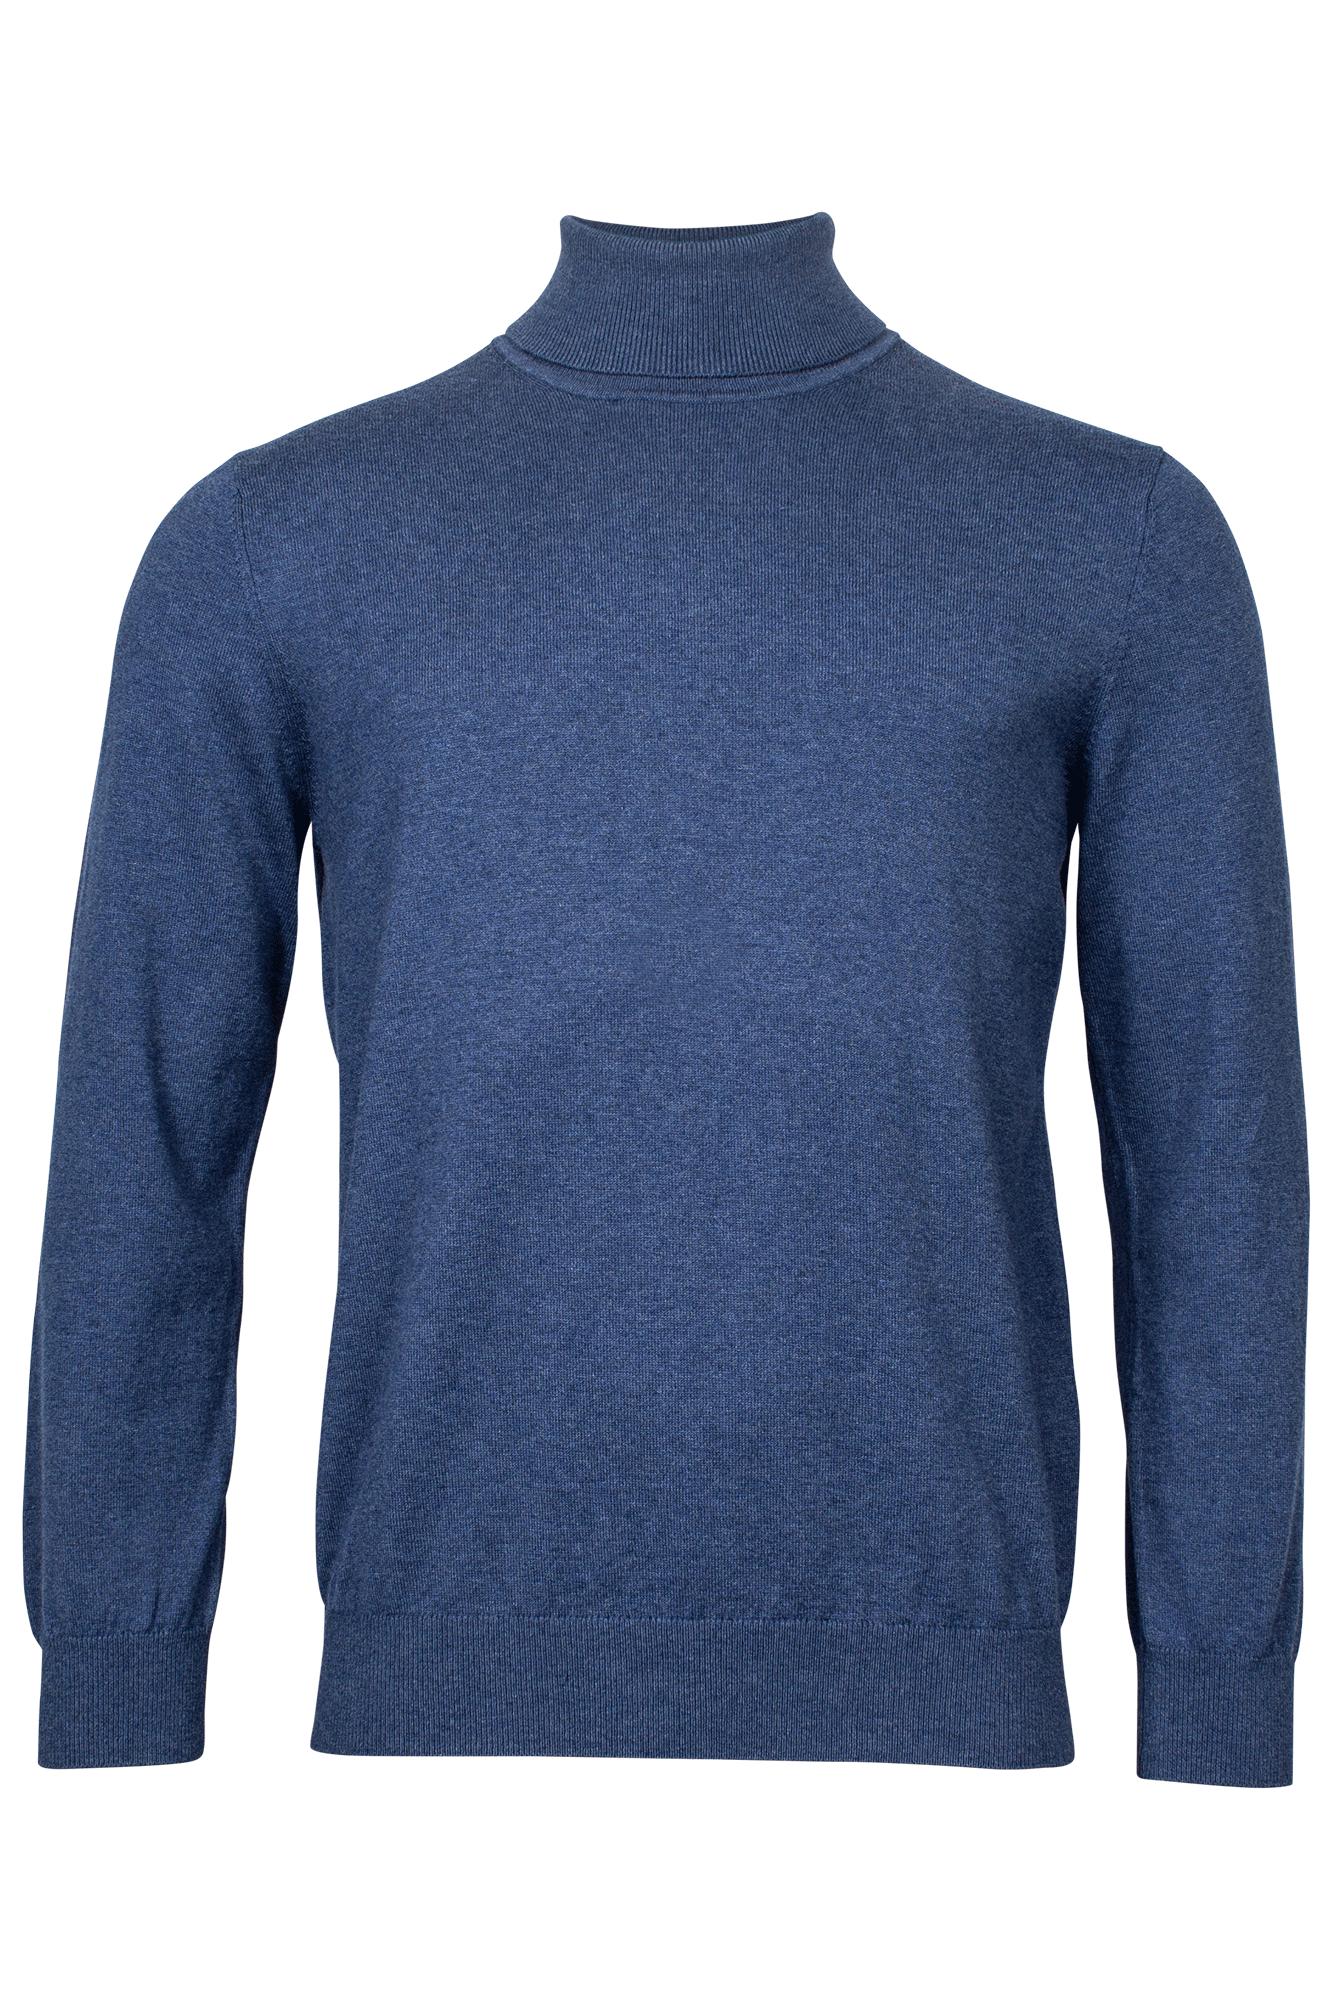 Baileys coltrui, jeans blauw